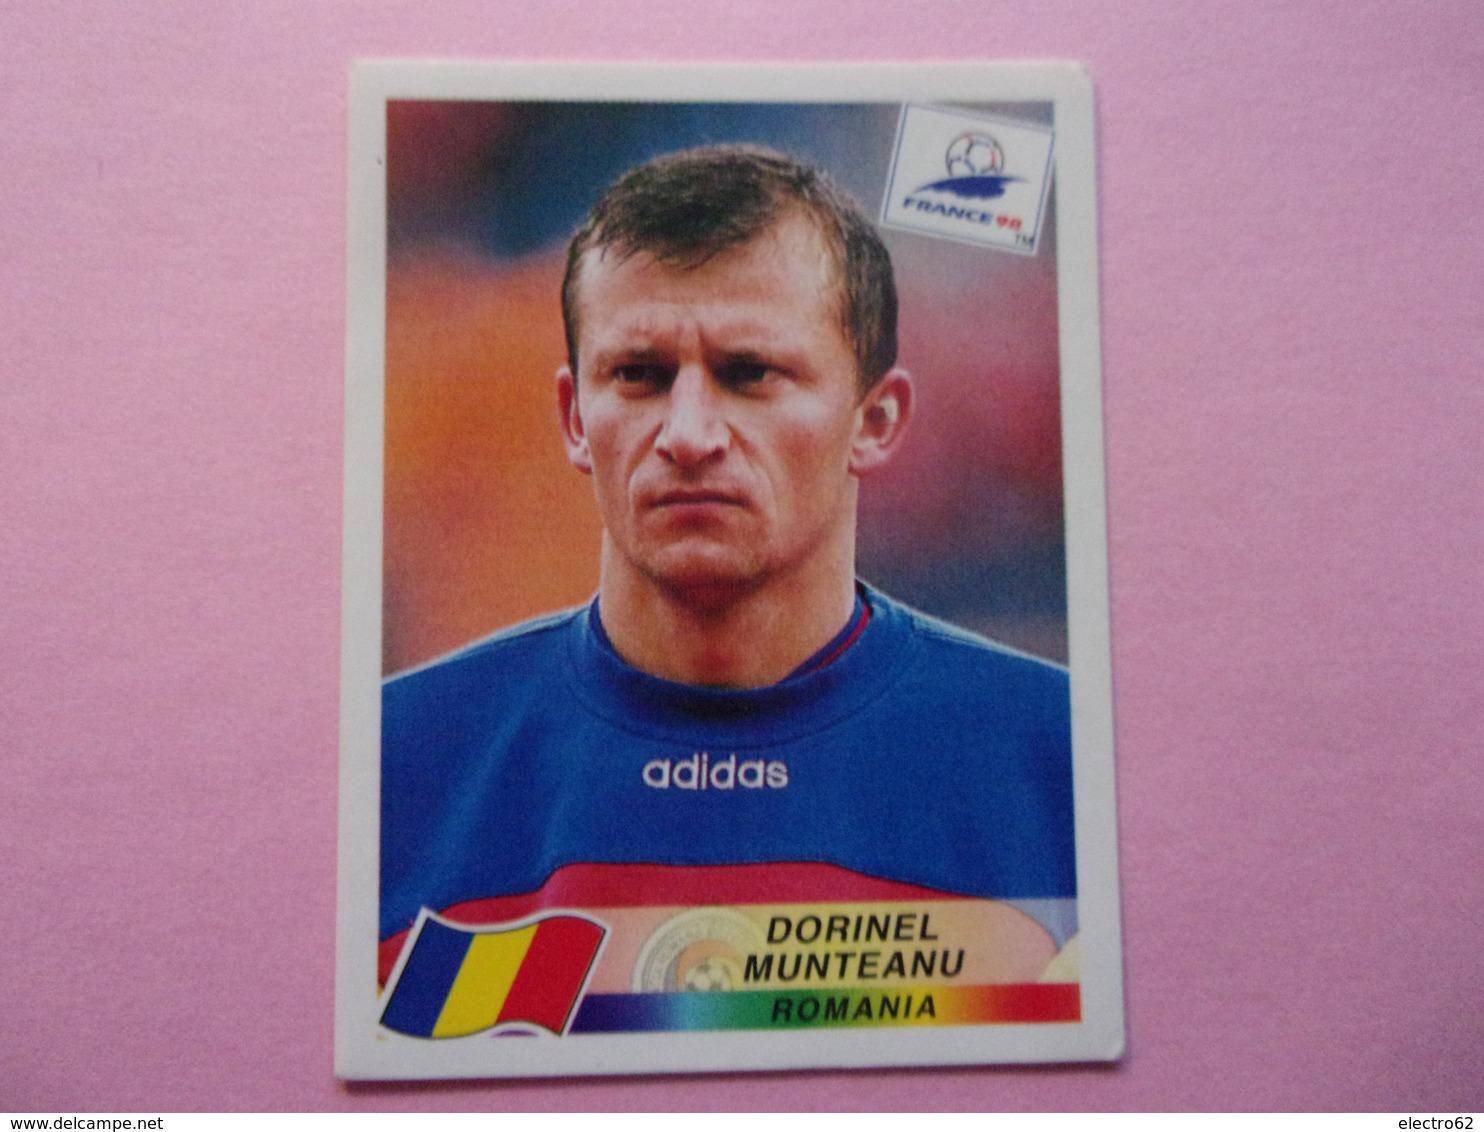 PANINI Football FRANCE 98 Dorinel MUNTEANU  Roumanie Roumania DANONE - Panini